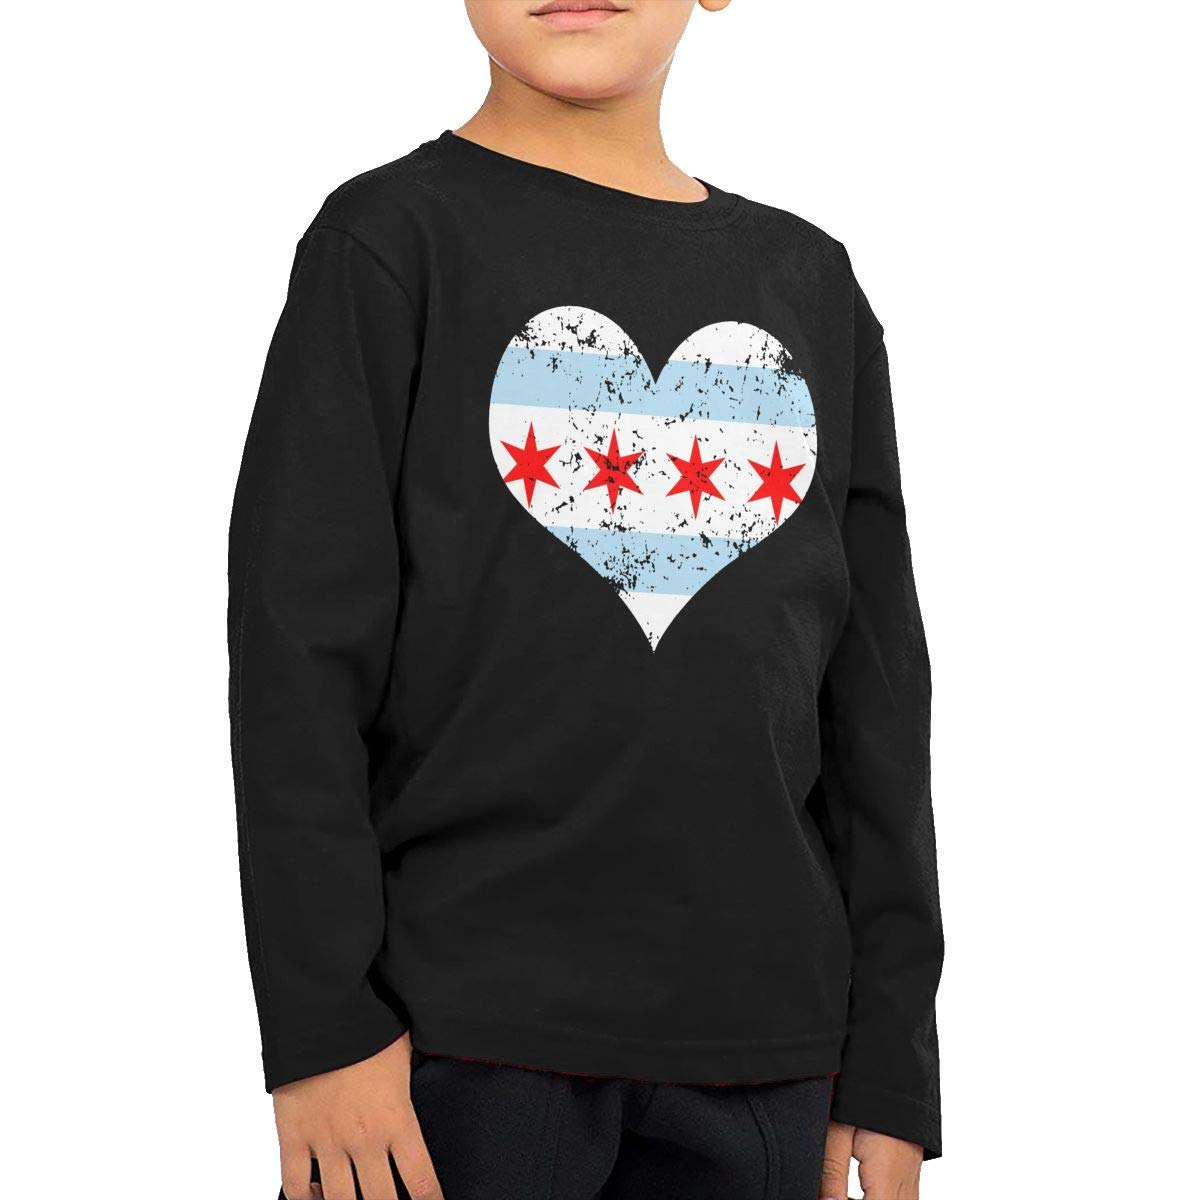 UGFGF-S1 Chicago Heart Flag Fashion Toddler Kid Baby Boys Girls Long Sleeve Tee Clothing